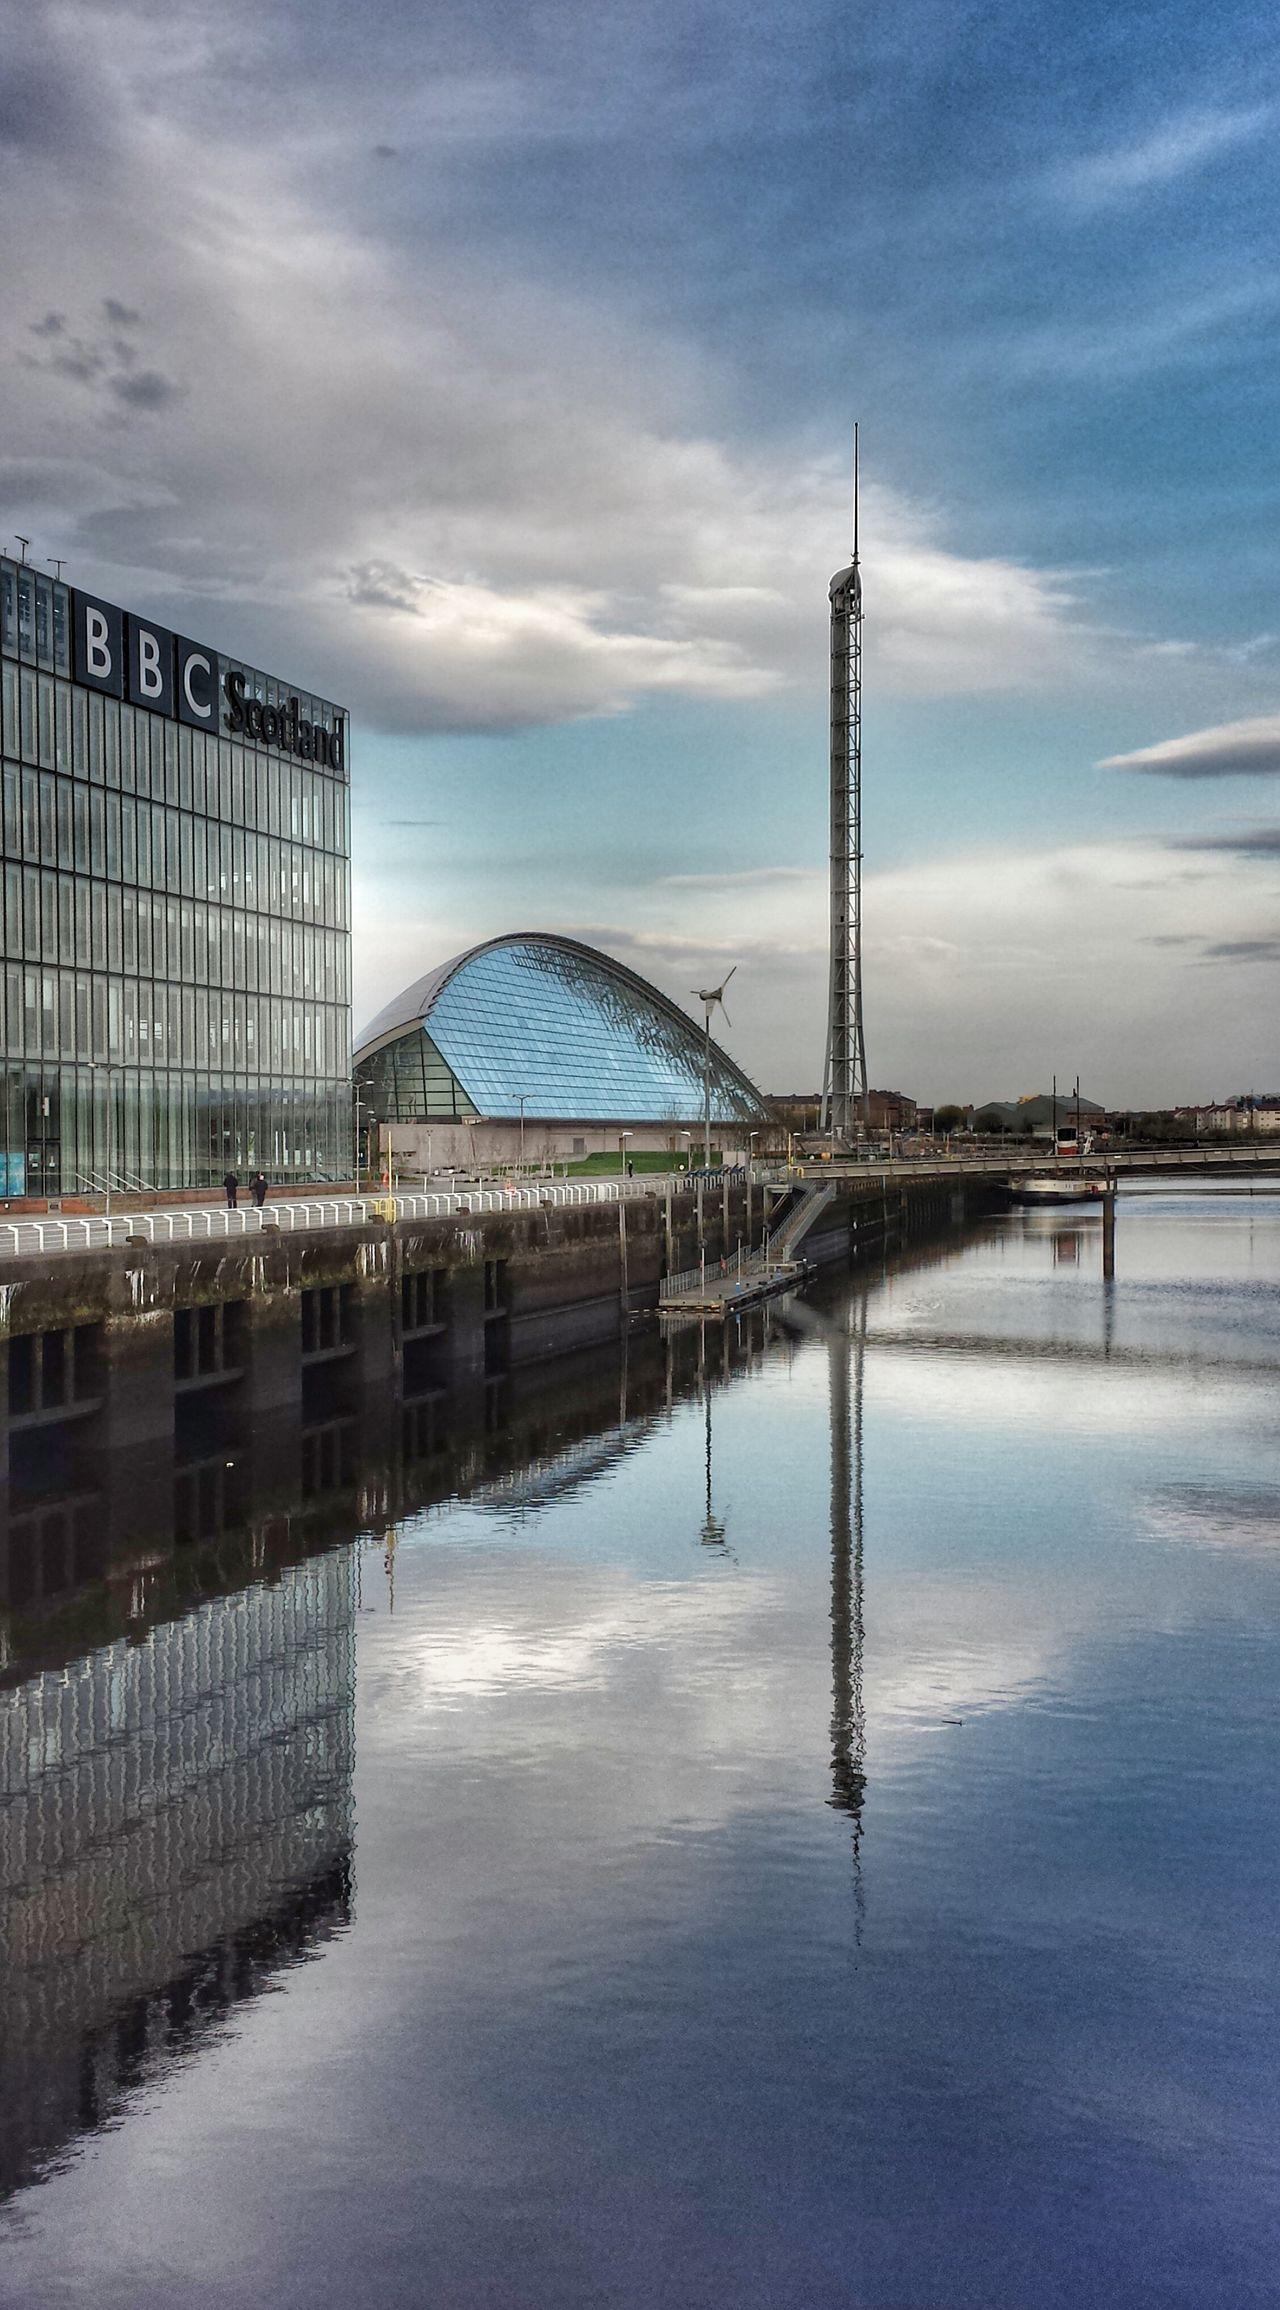 Glasgow Tower River Clyde Glasgow Science Centre  BBCScotland